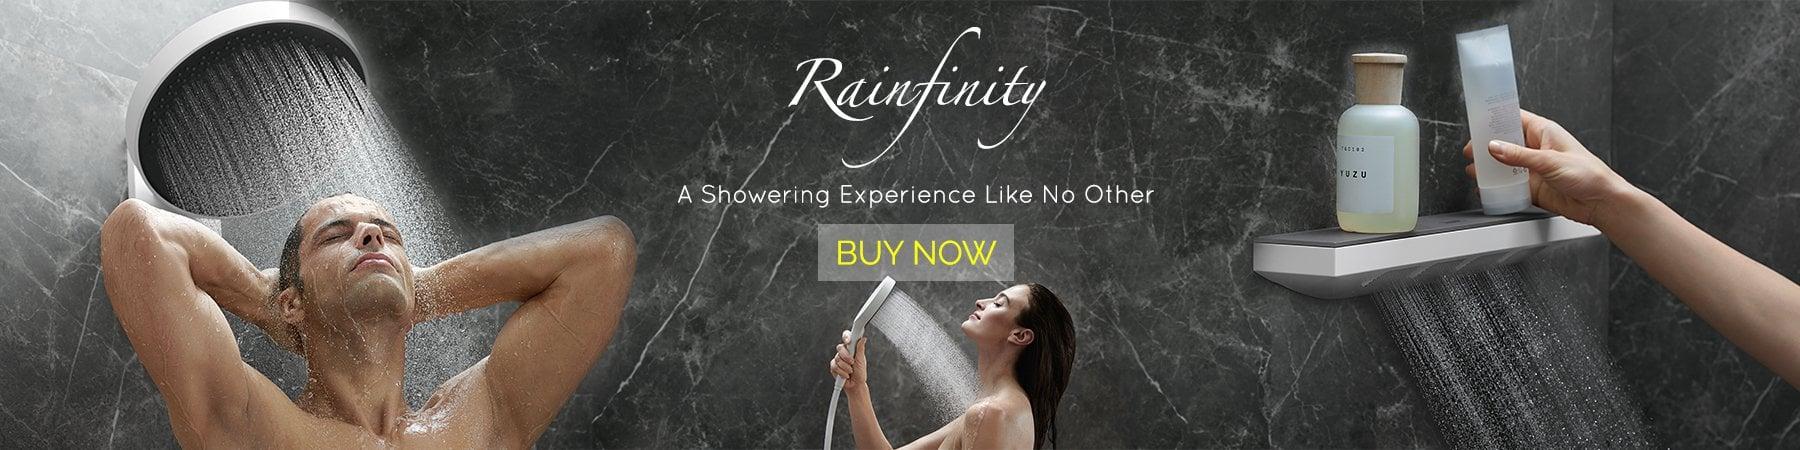 RAINFINITY